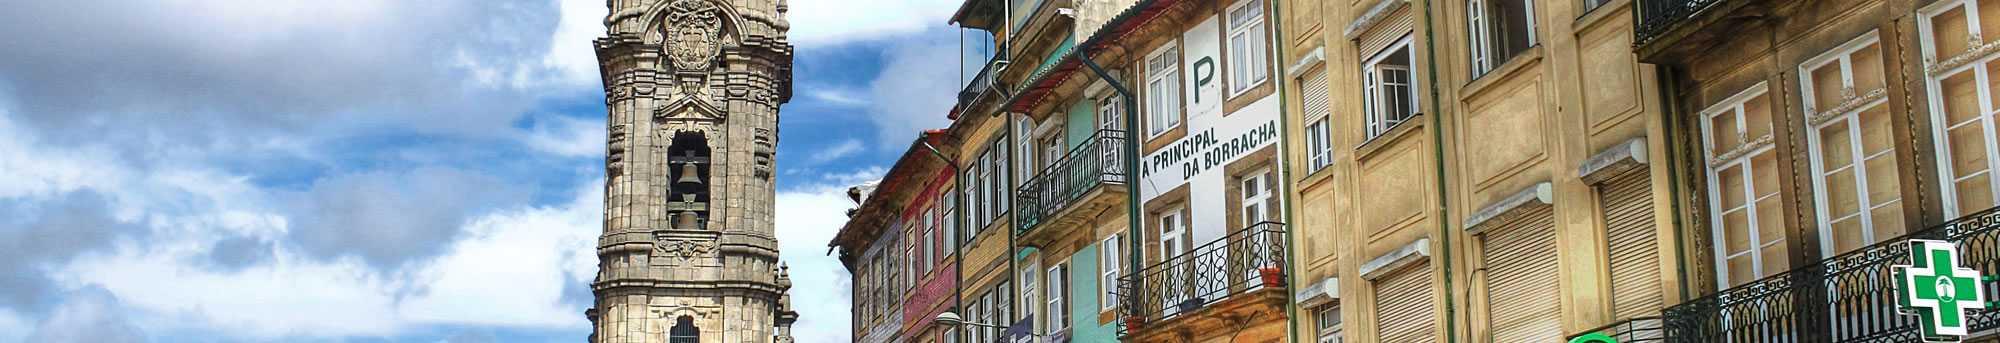 Ruta Secretos de Oporto